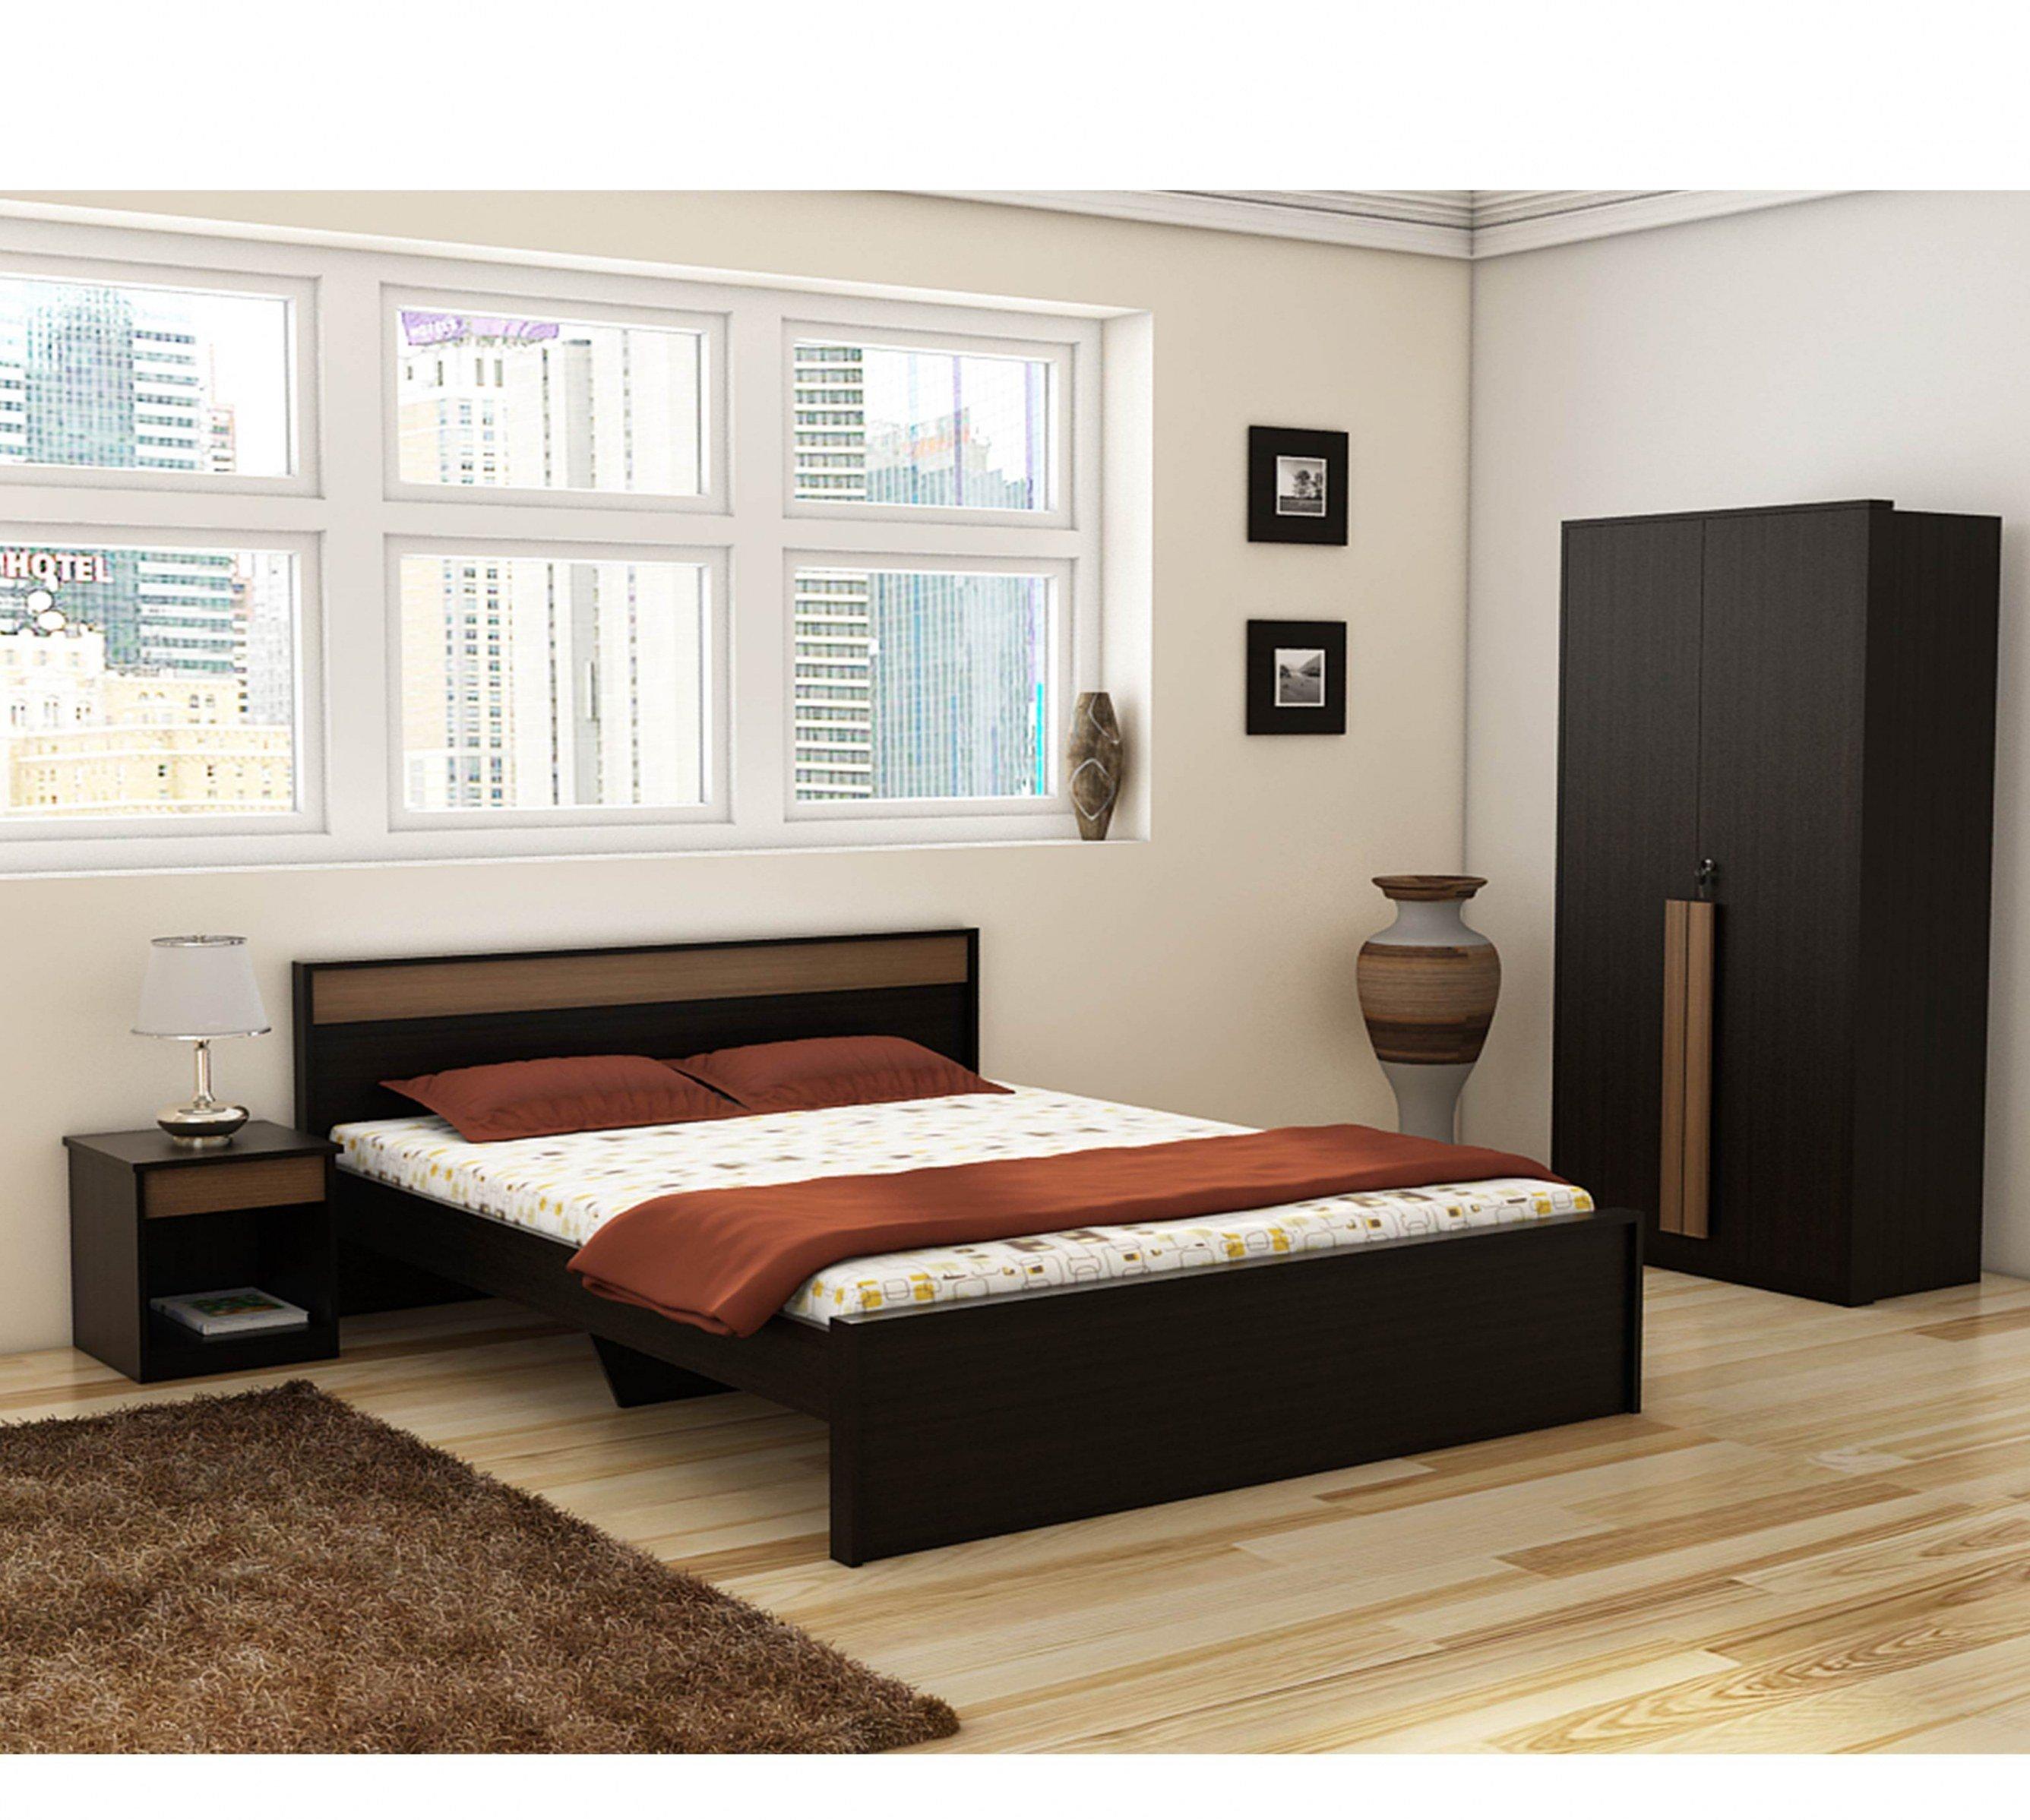 King Bedroom Set Ikea Elegant Low Beds Ikea White Bedroom Furniture Sets Ikea White Hemnes